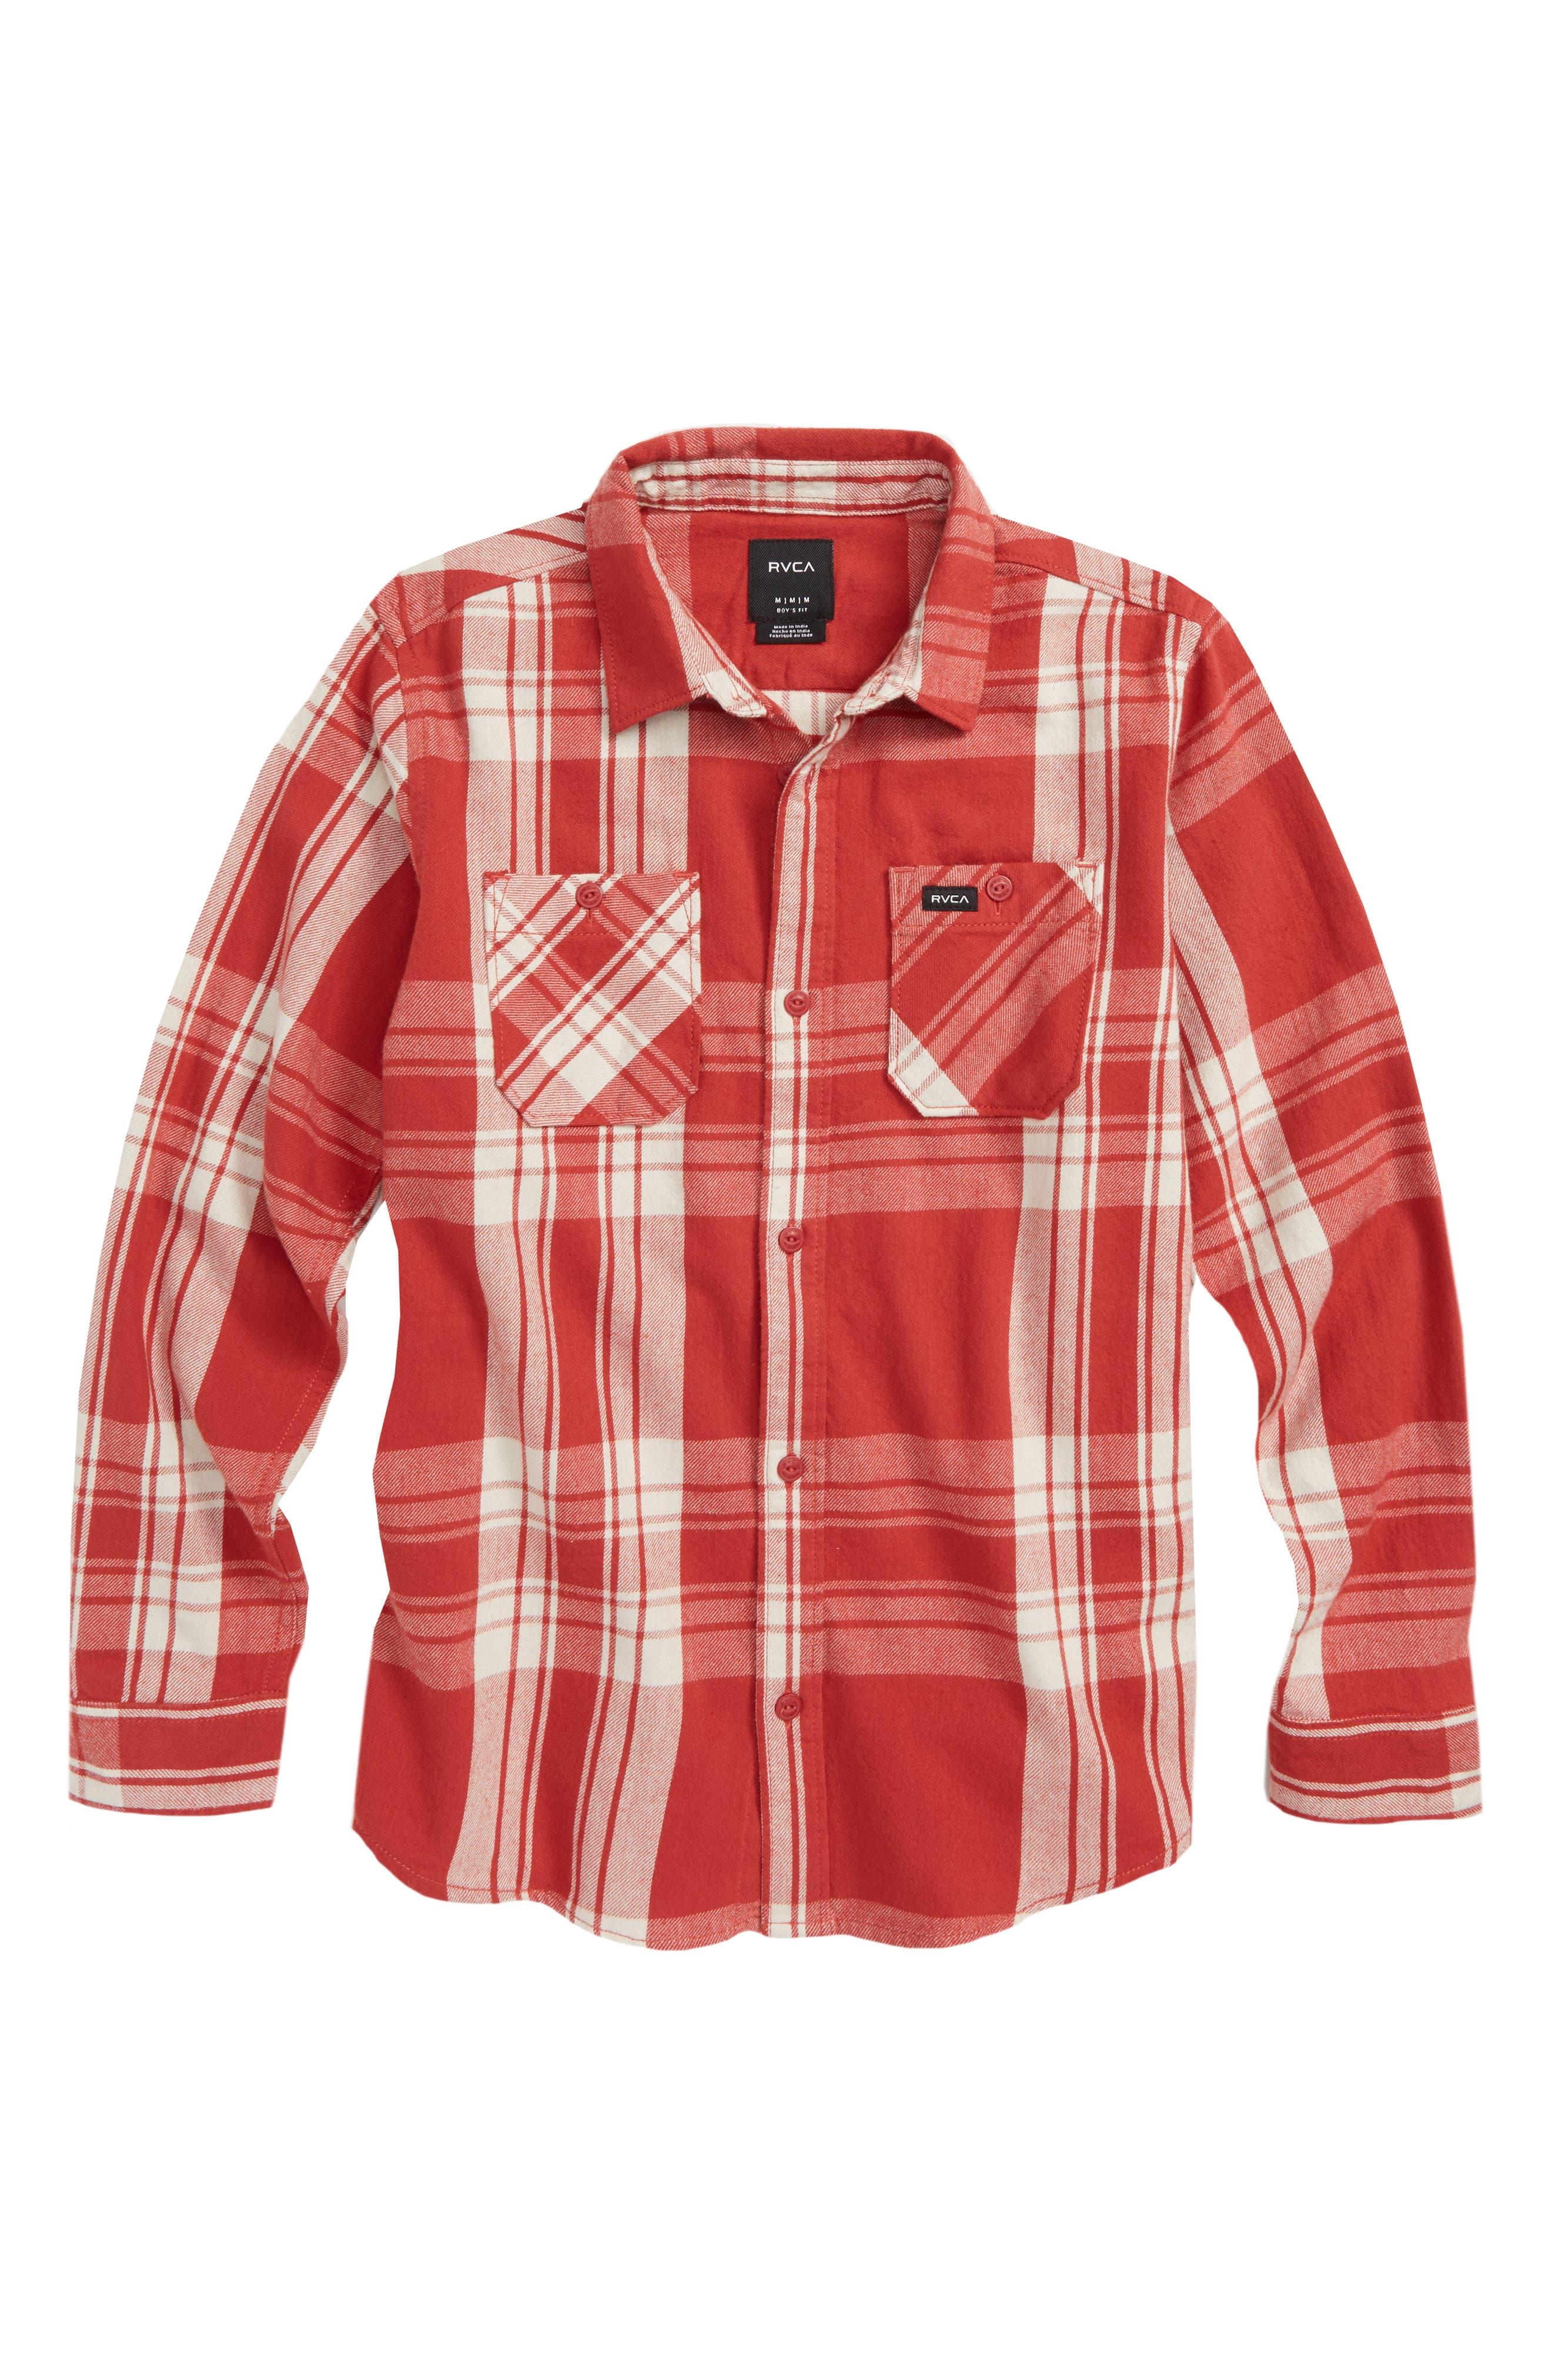 RVCA Wanted Plaid Flannel Shirt, Main, color, GARNET